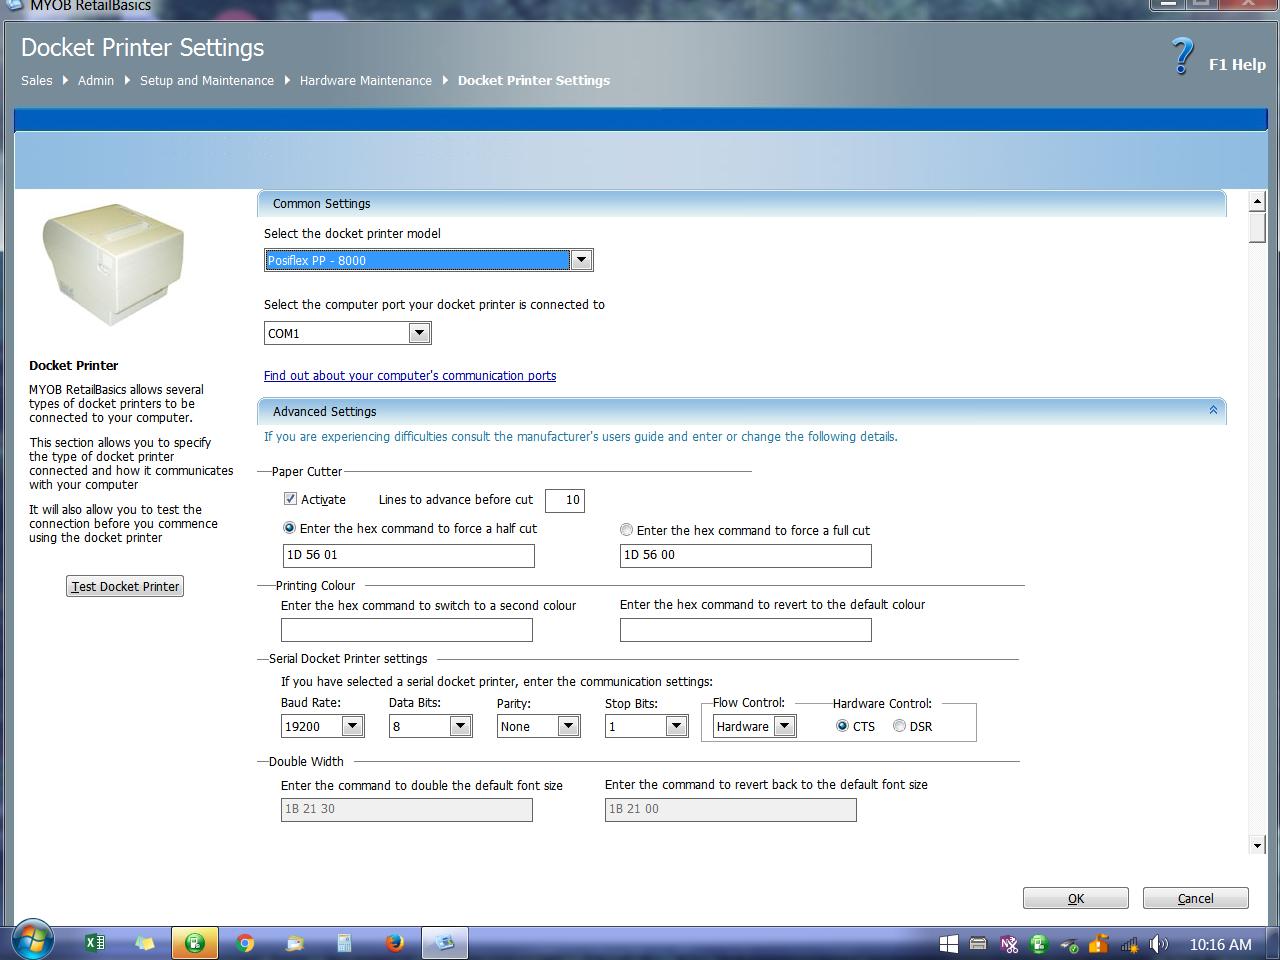 Solved: Posiflex PP-8000 issues in RetailBasics - MYOB Community